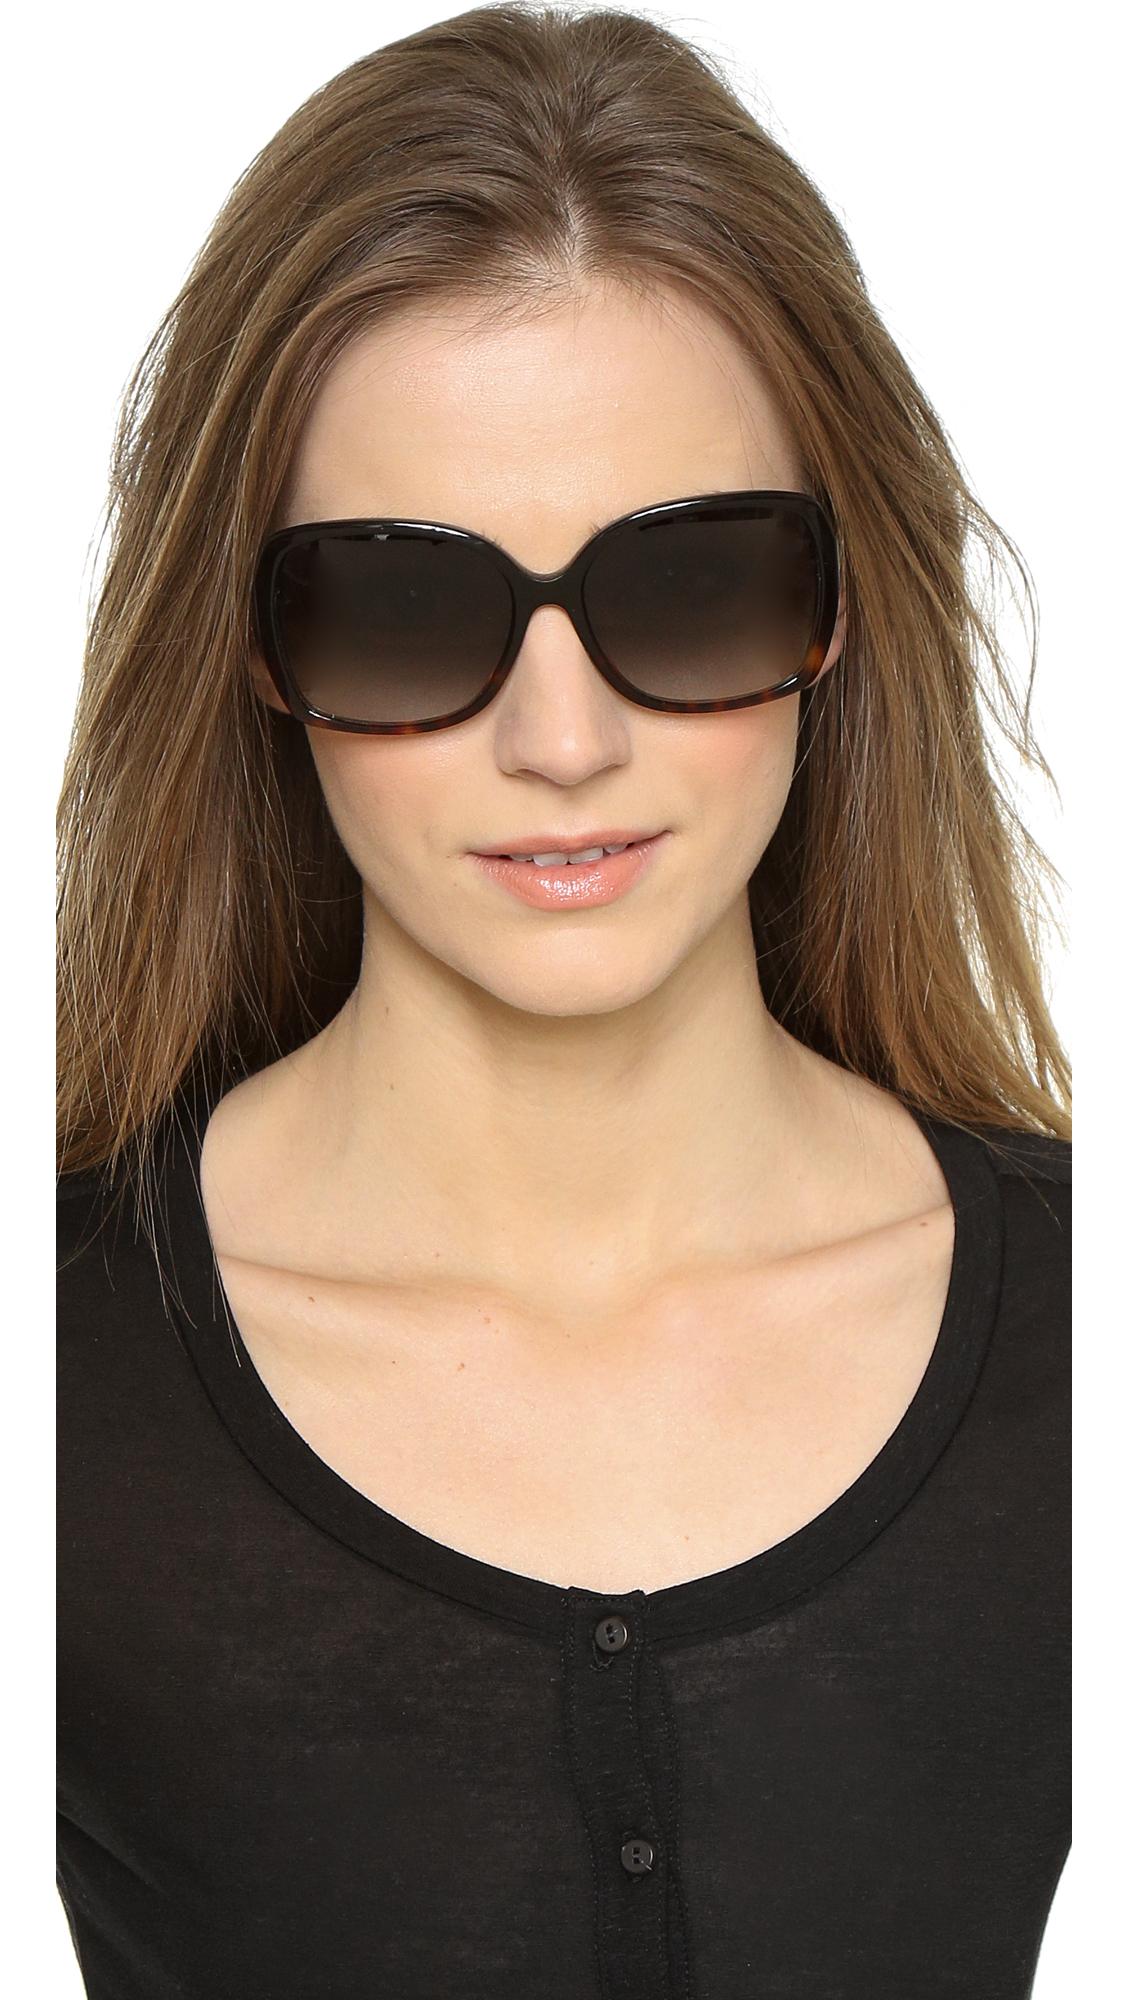 1d01de5b57920 Kate Spade Darilynn Sunglasses in Black - Lyst